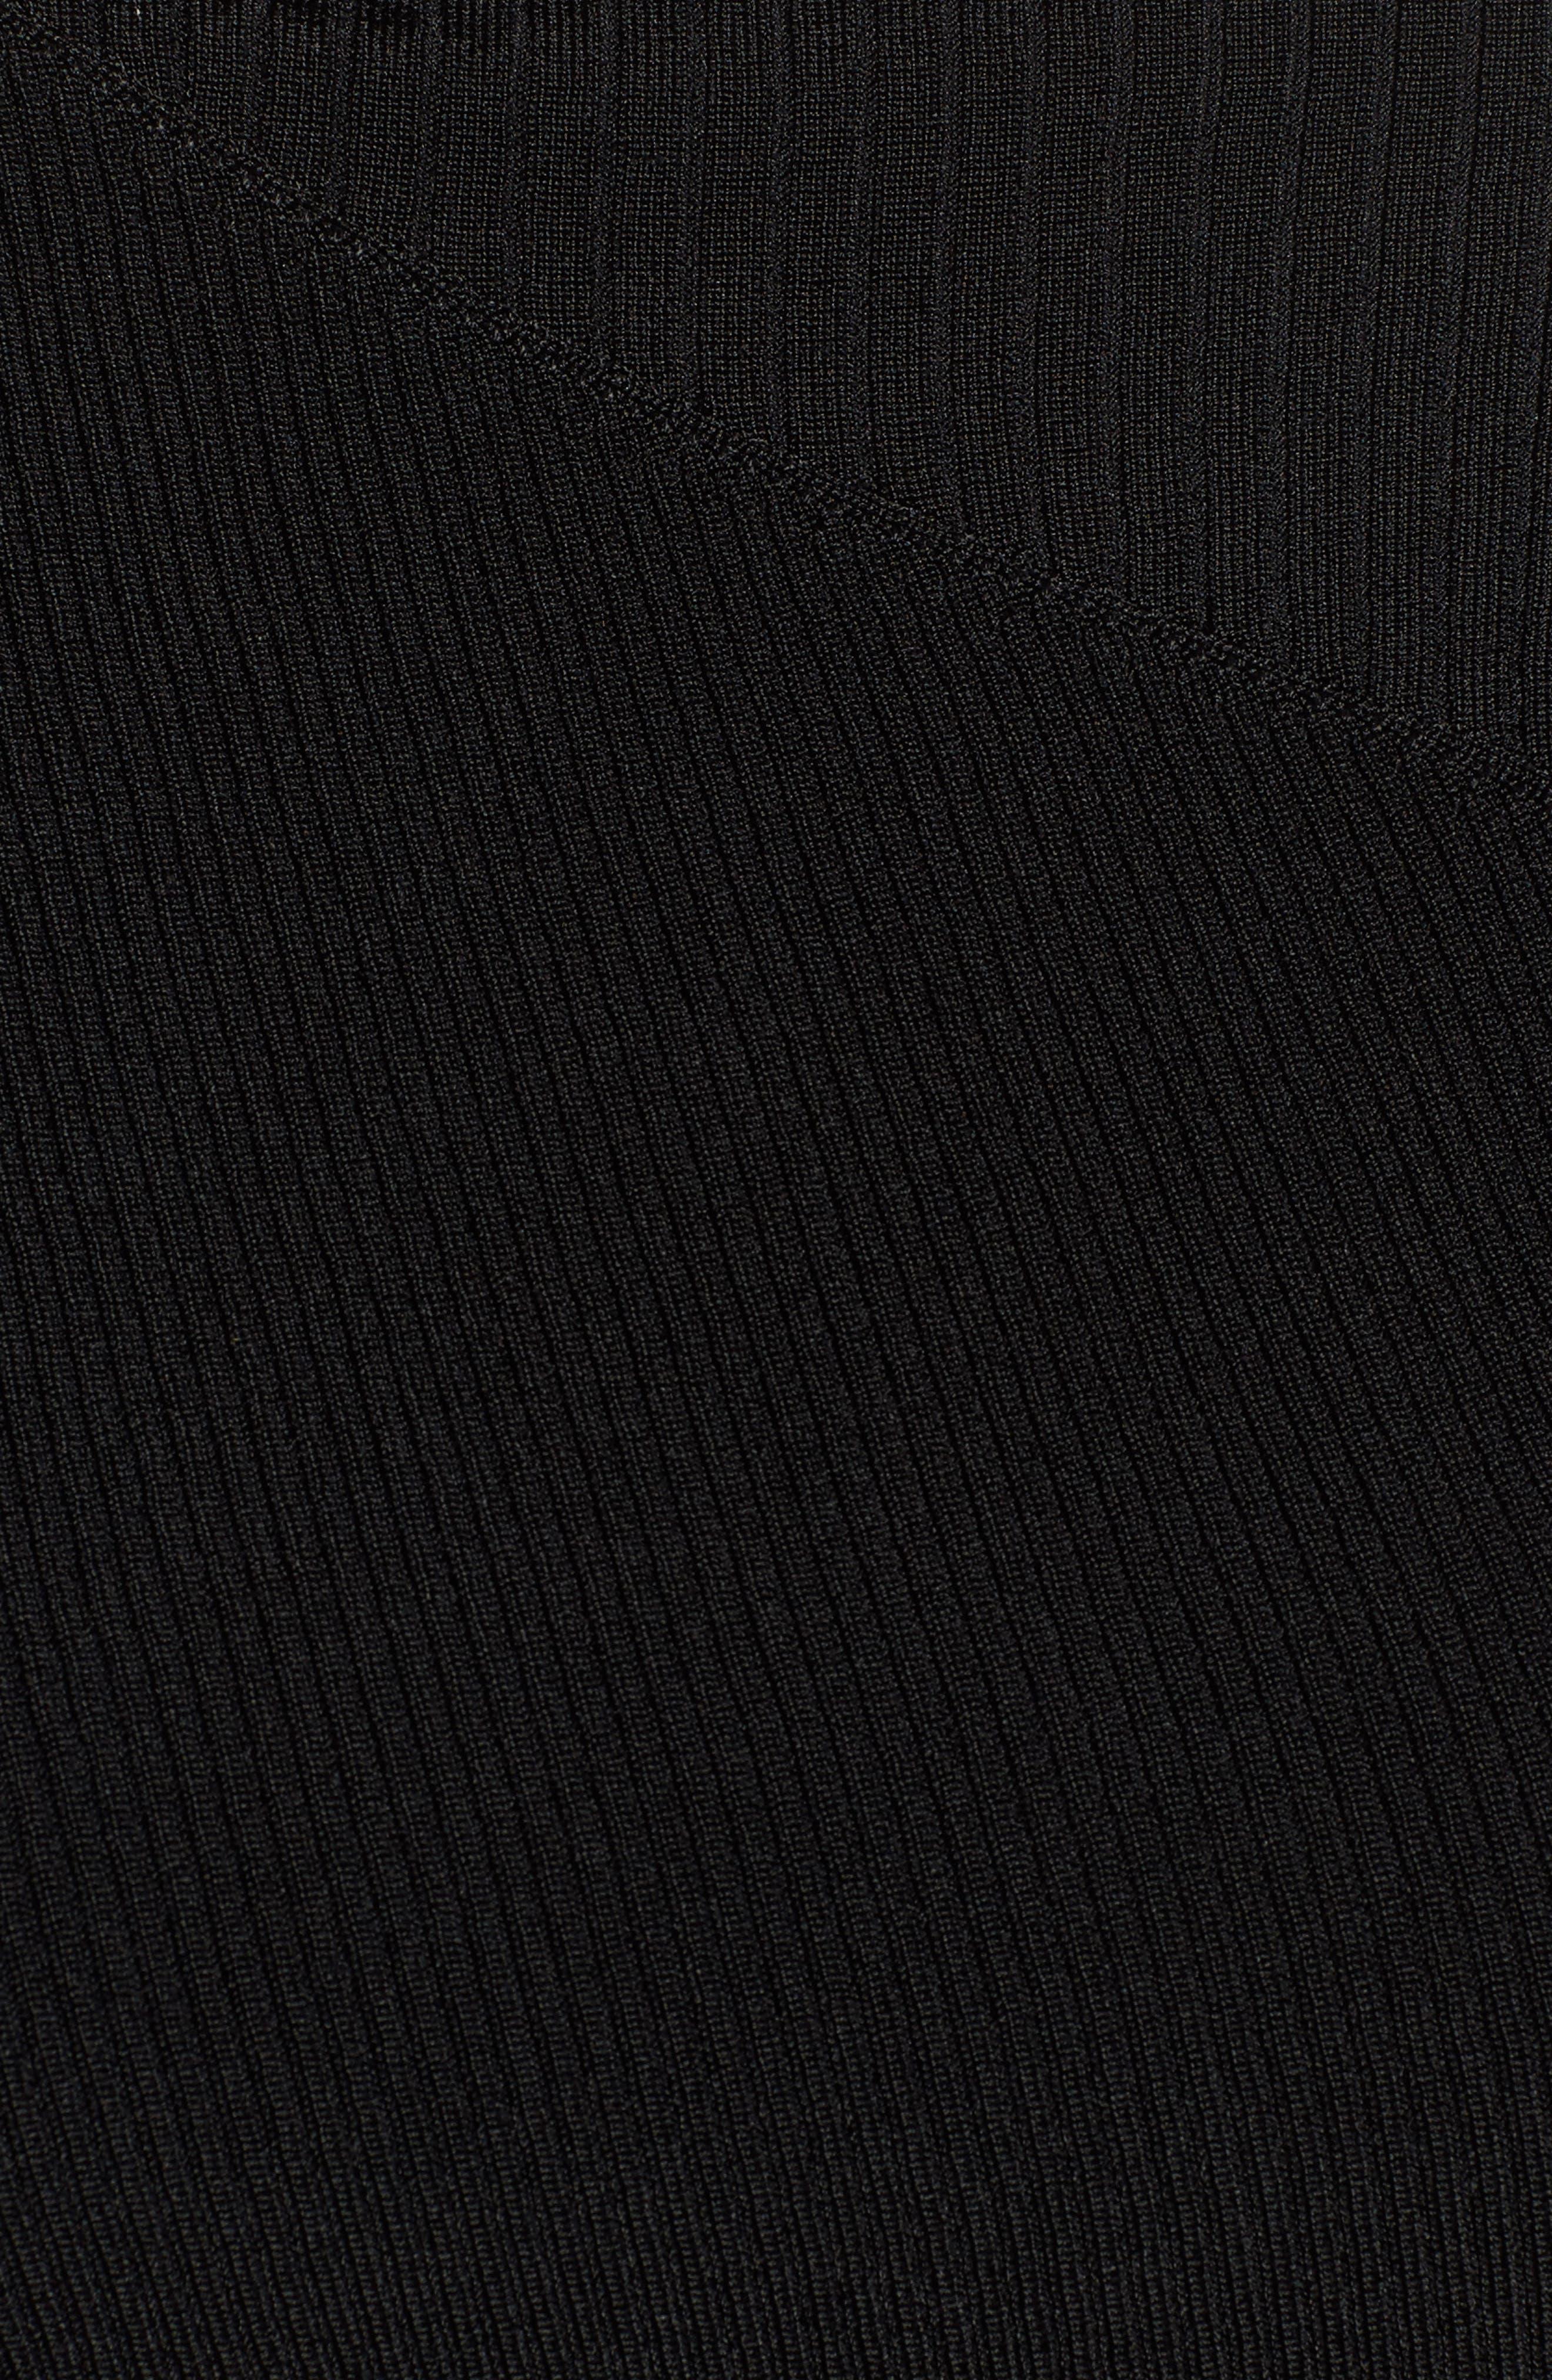 Slash Neck Asymmetrical Top,                             Alternate thumbnail 5, color,                             001